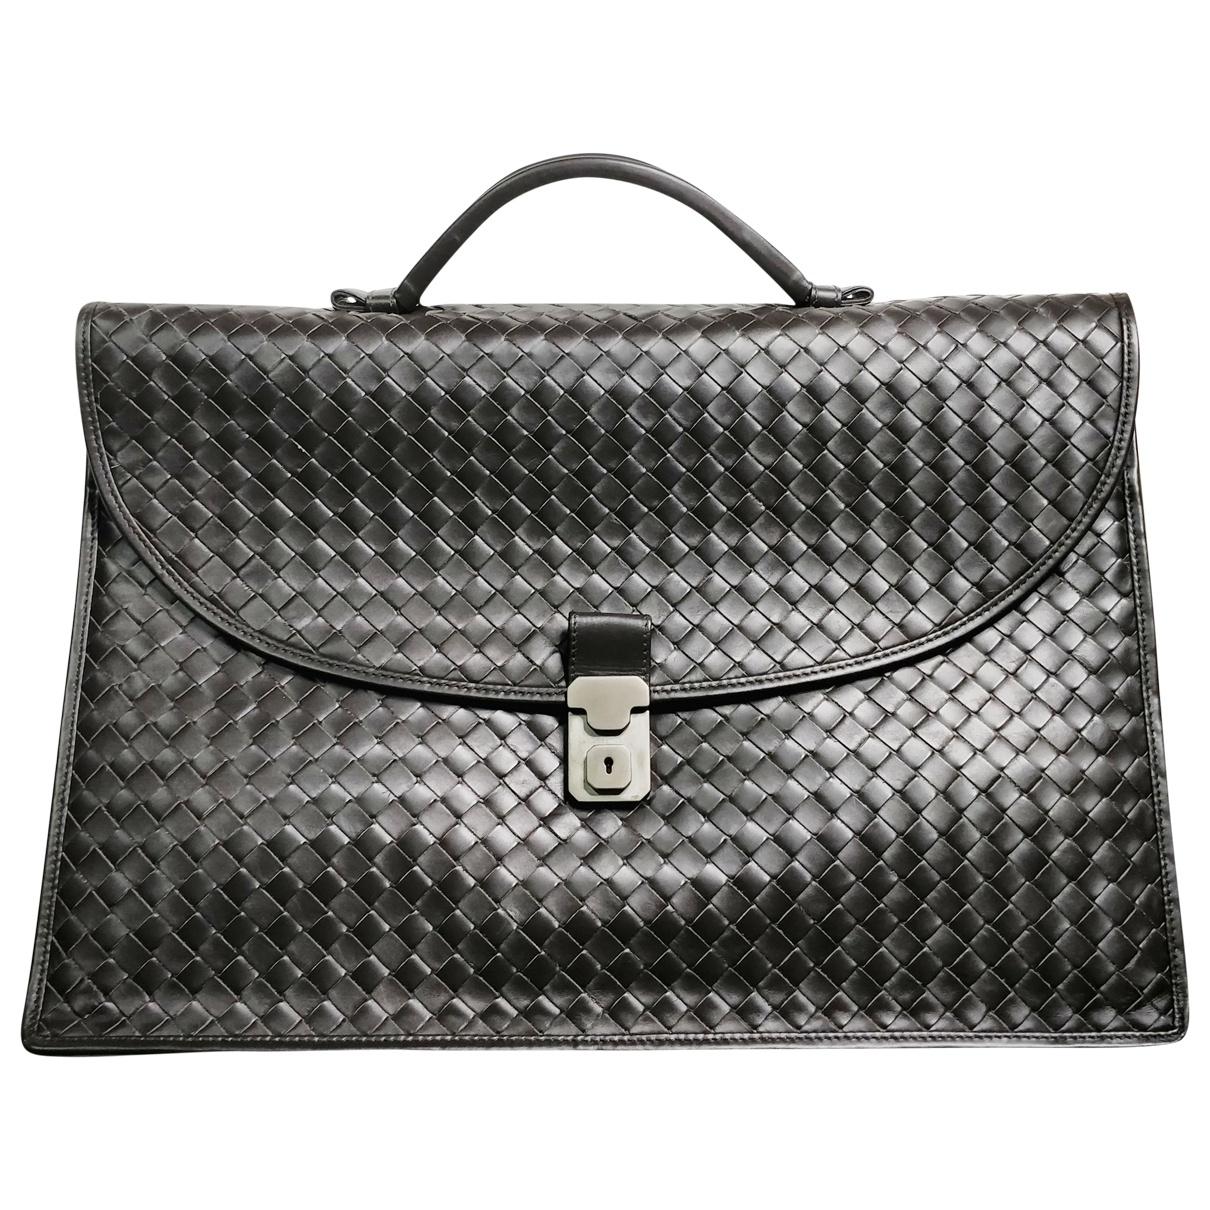 Bottega Veneta \N Brown Leather bag for Men \N